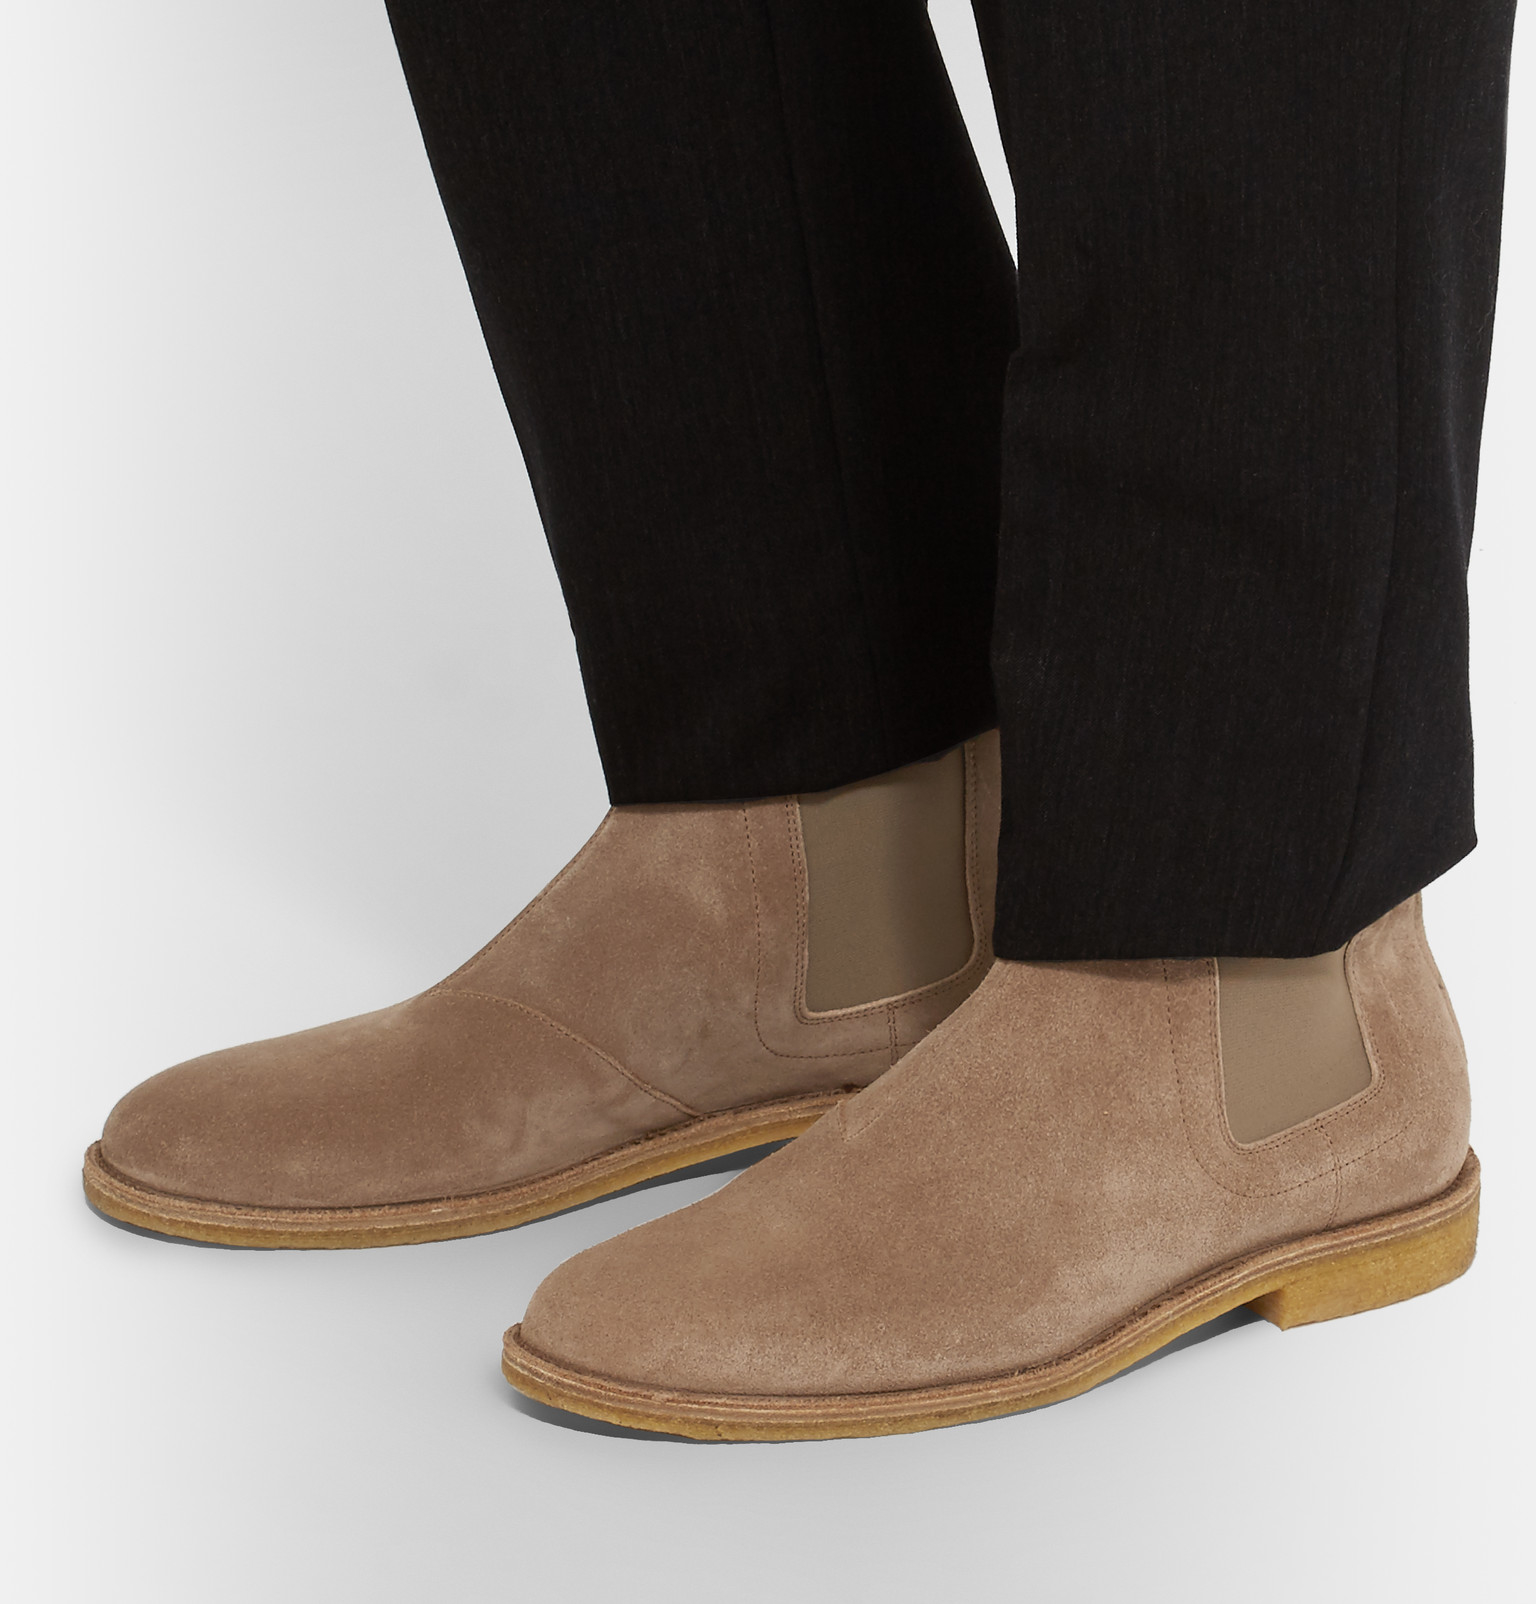 Elegant Bottega Veneta Crepe Sole Chelsea Boots In Brown  Lyst